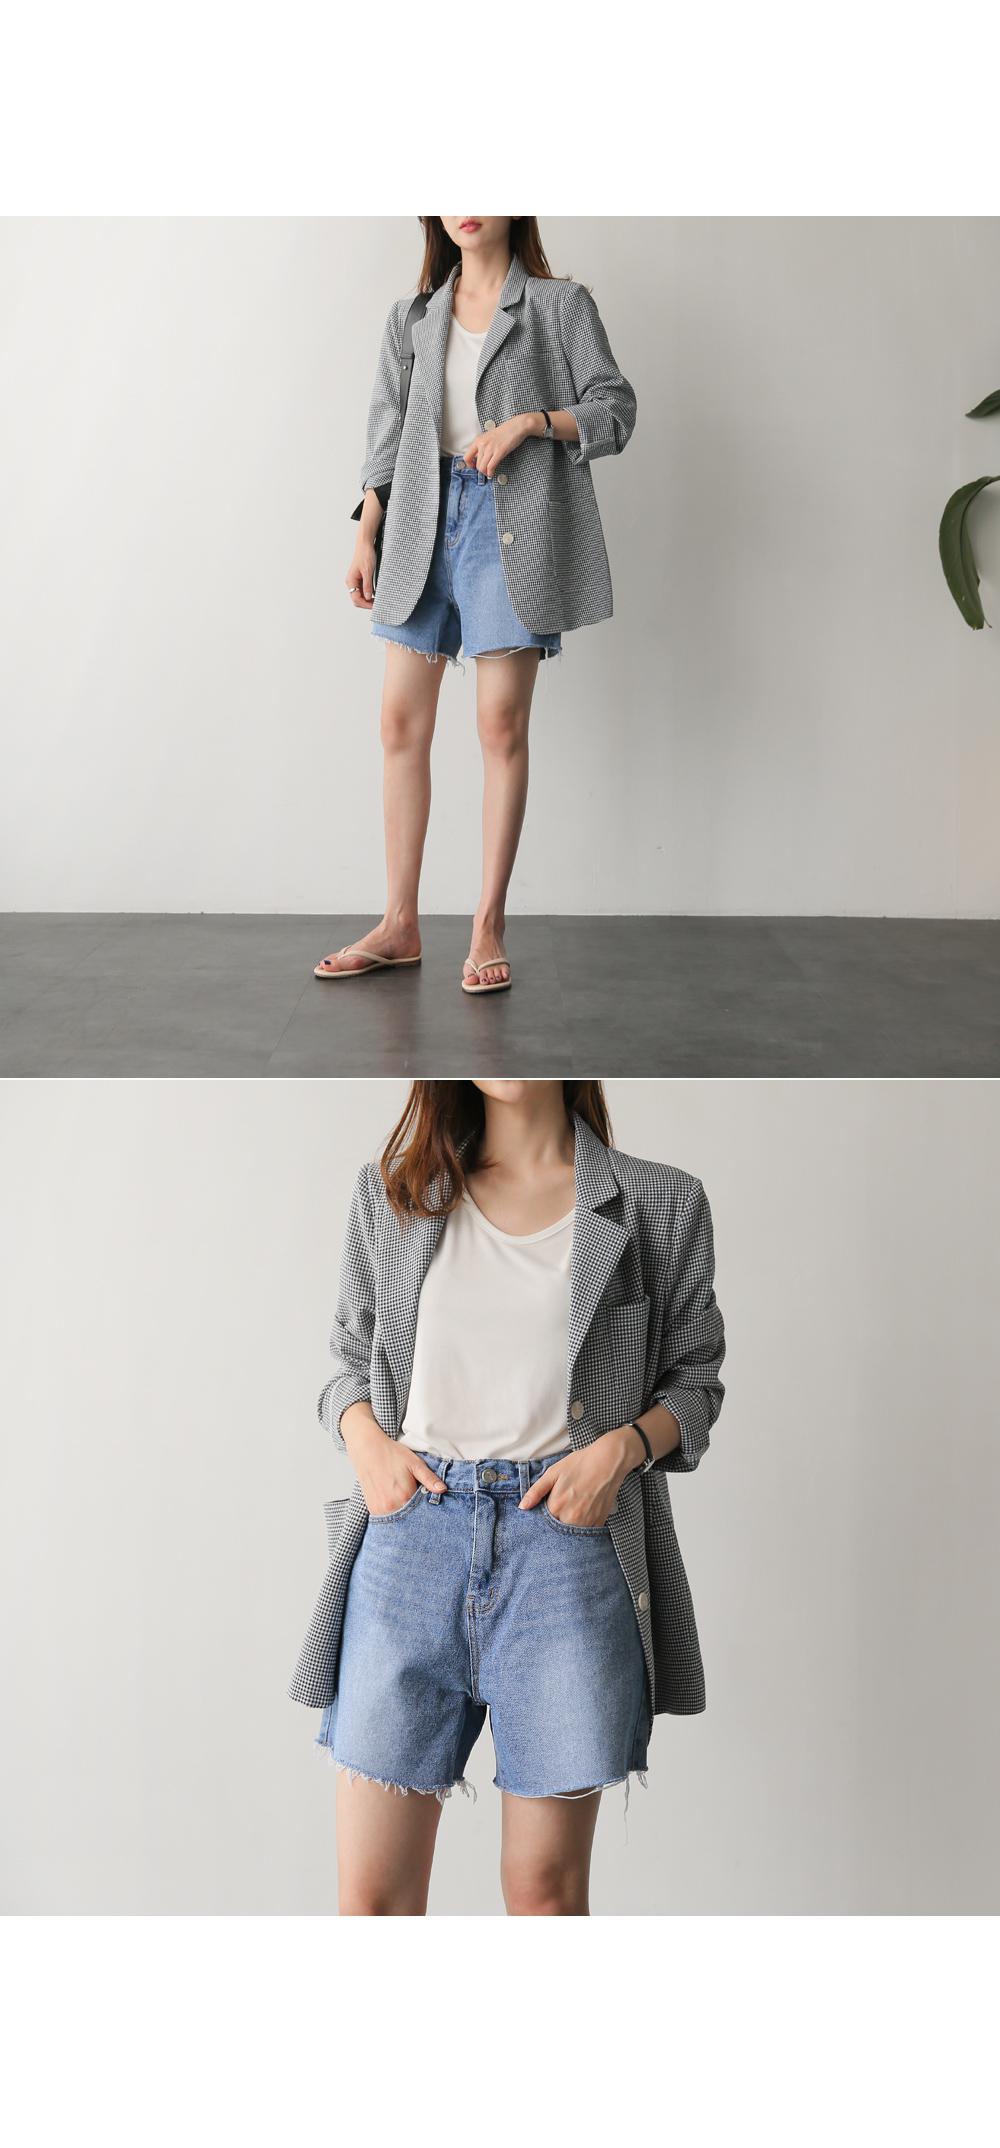 Icing pants